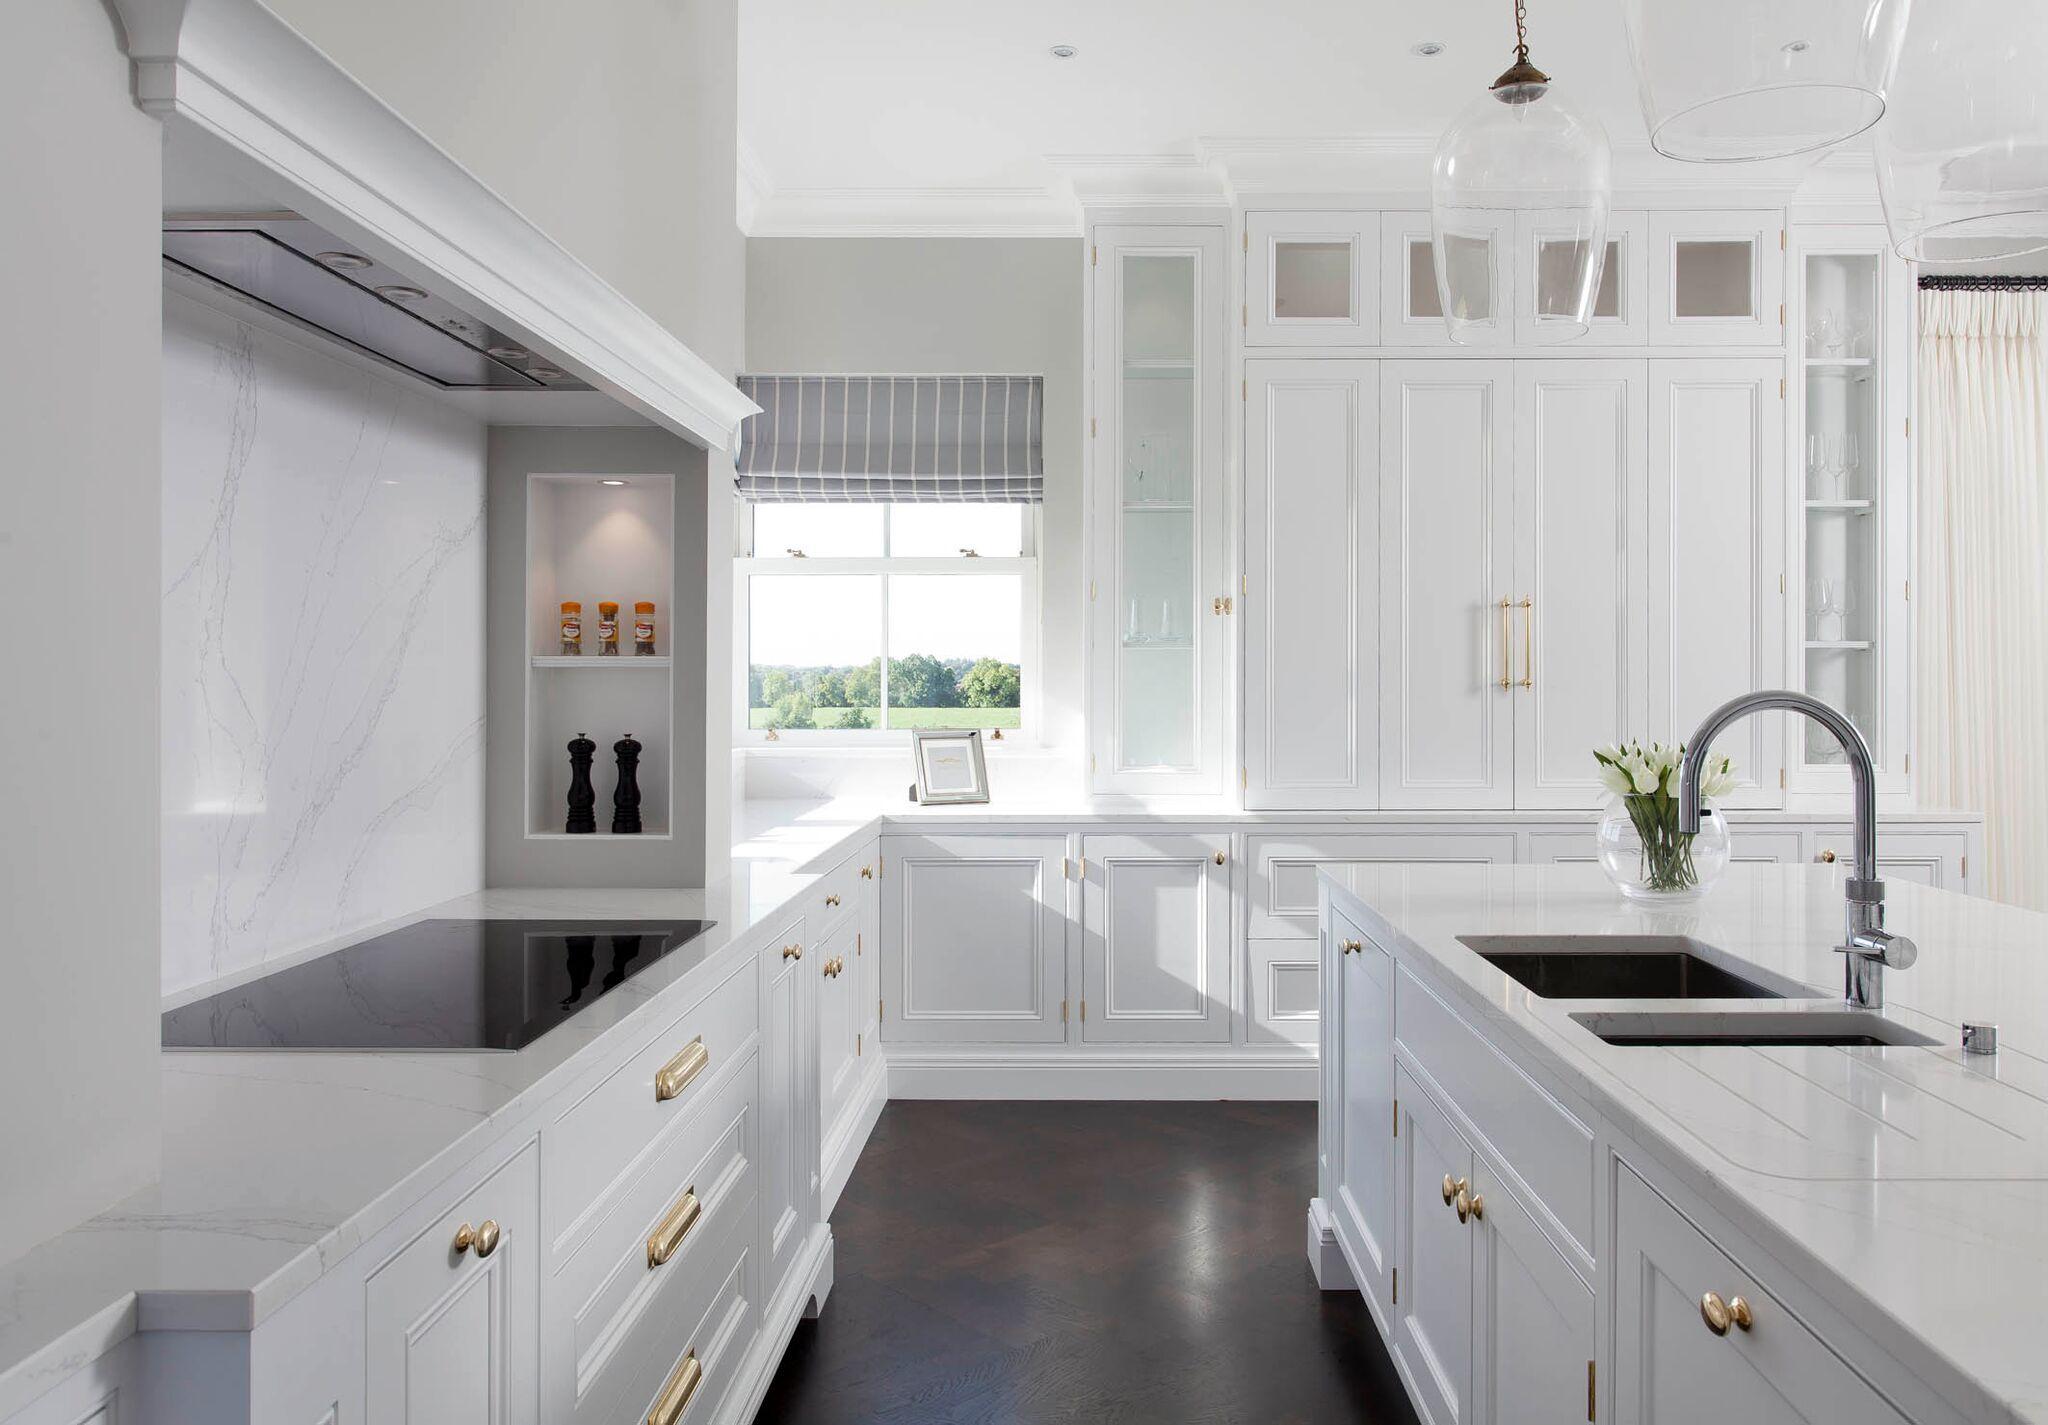 Woodale Drumree Handmade kitchen furniture, White